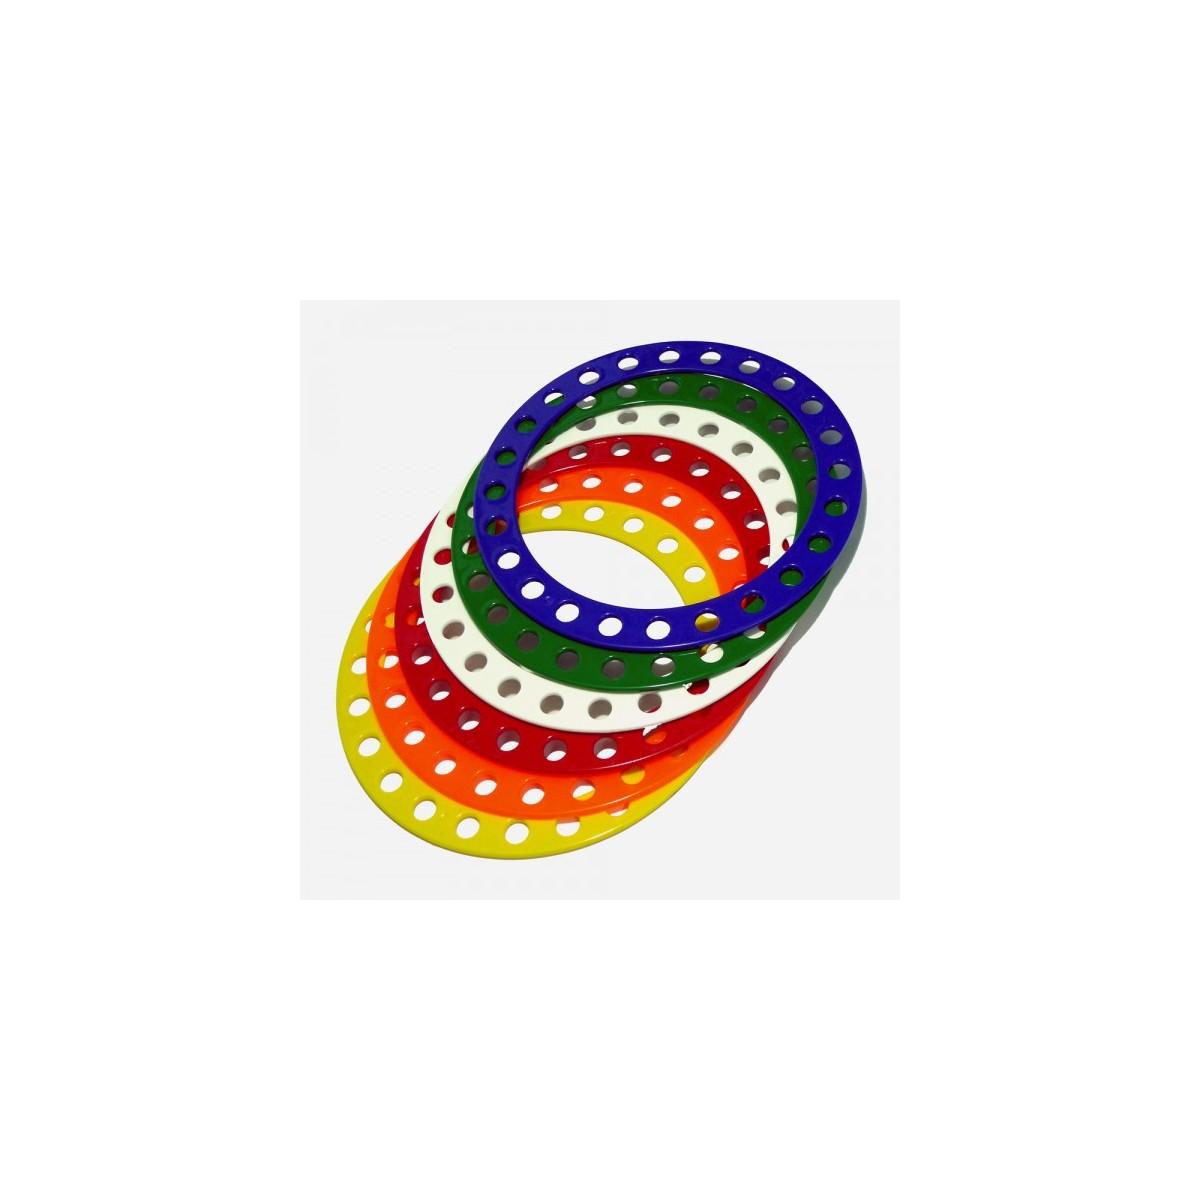 Anello Wind ring 32,5 cm